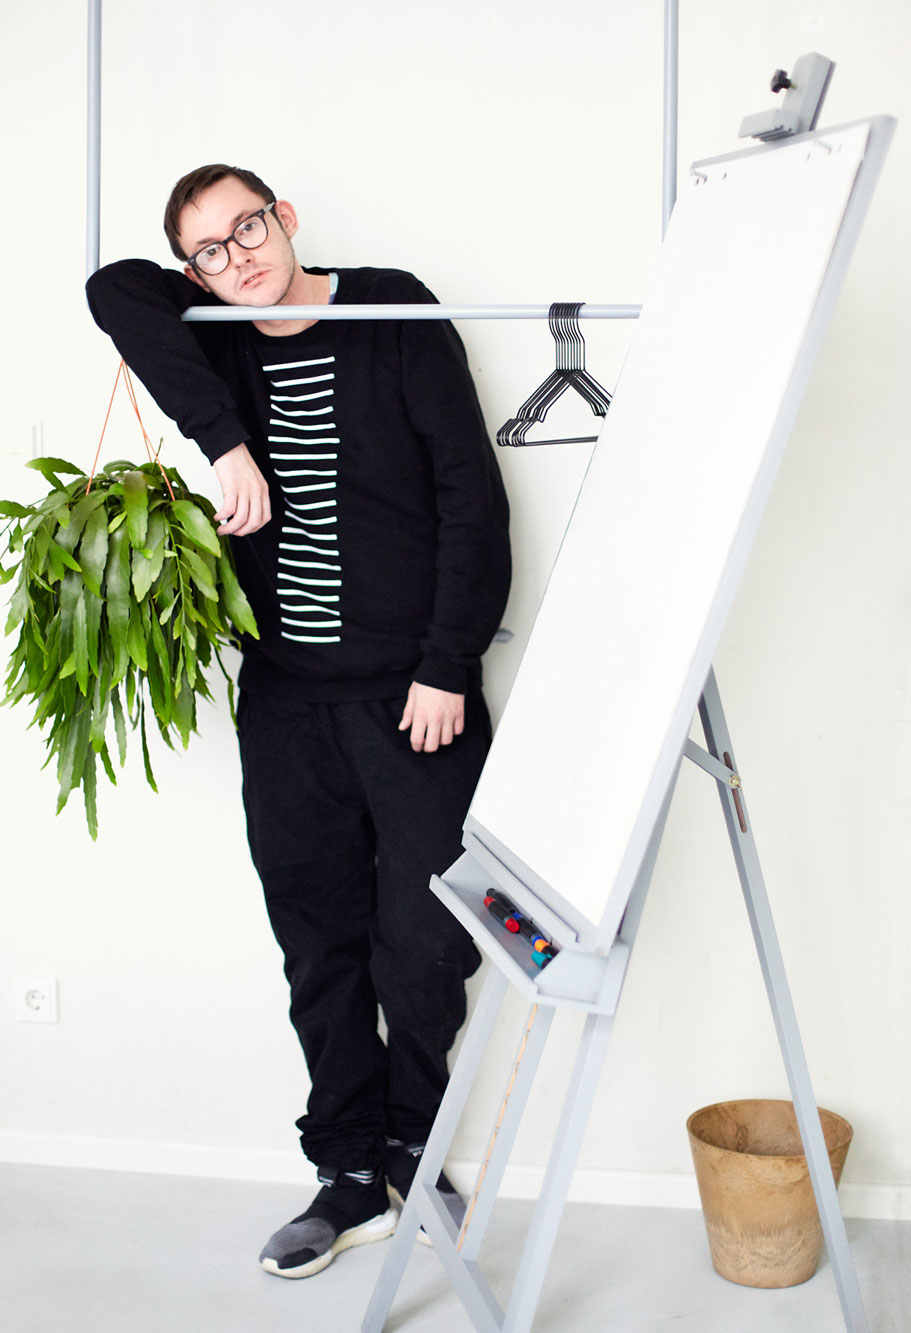 Hudson Mohawke, 2015 Portrait Patrick Desbrosses